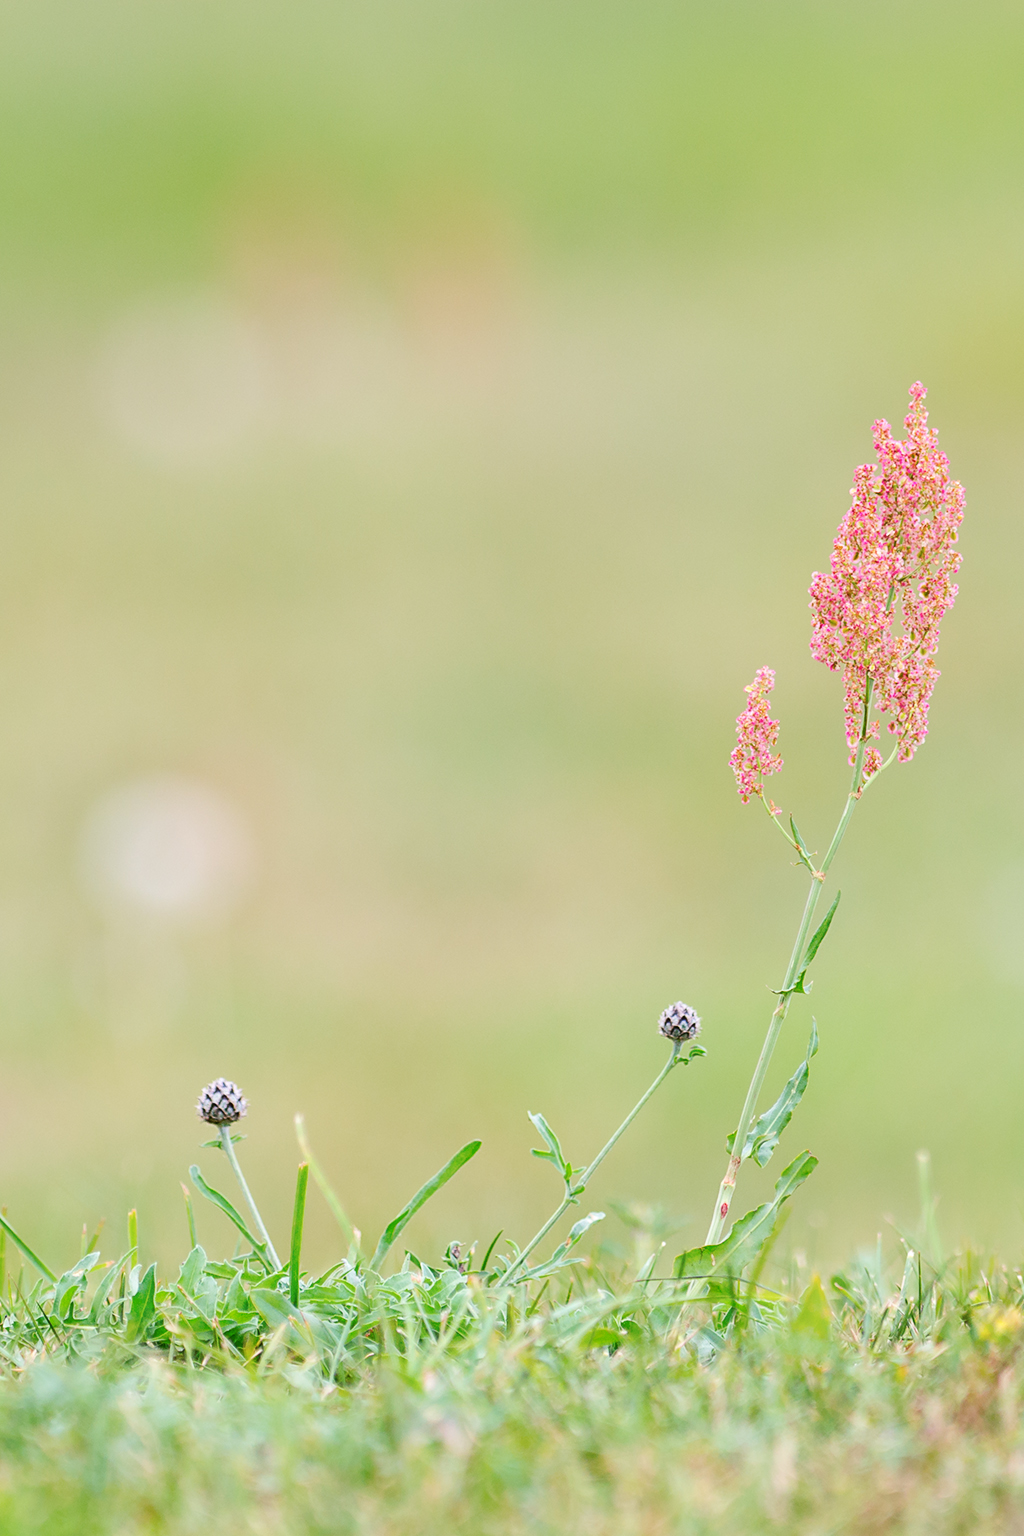 Grass Öland 2012